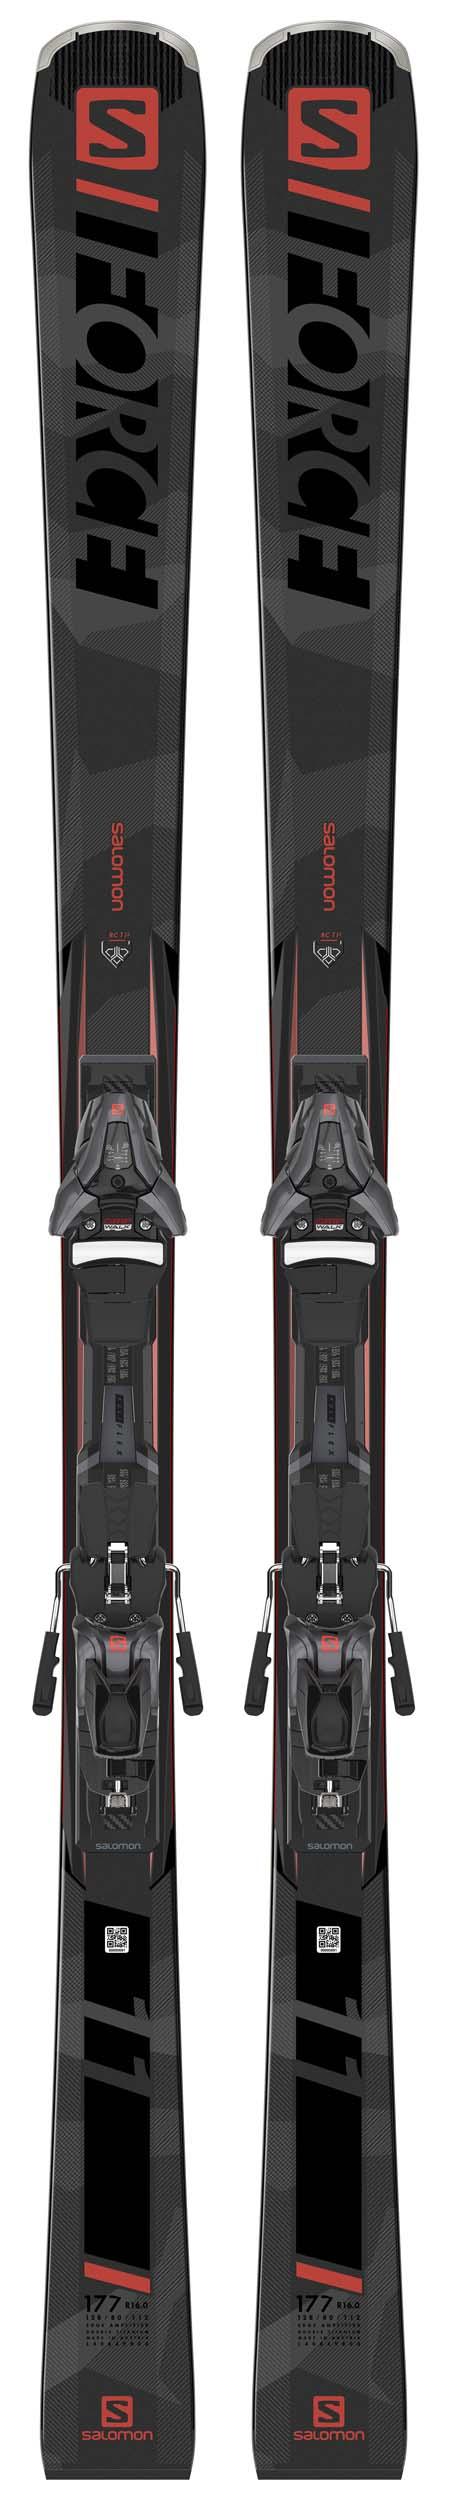 Salomon 2021 S/Force 11 Skis w/Z12 GW Bindings NEW !! 170cm